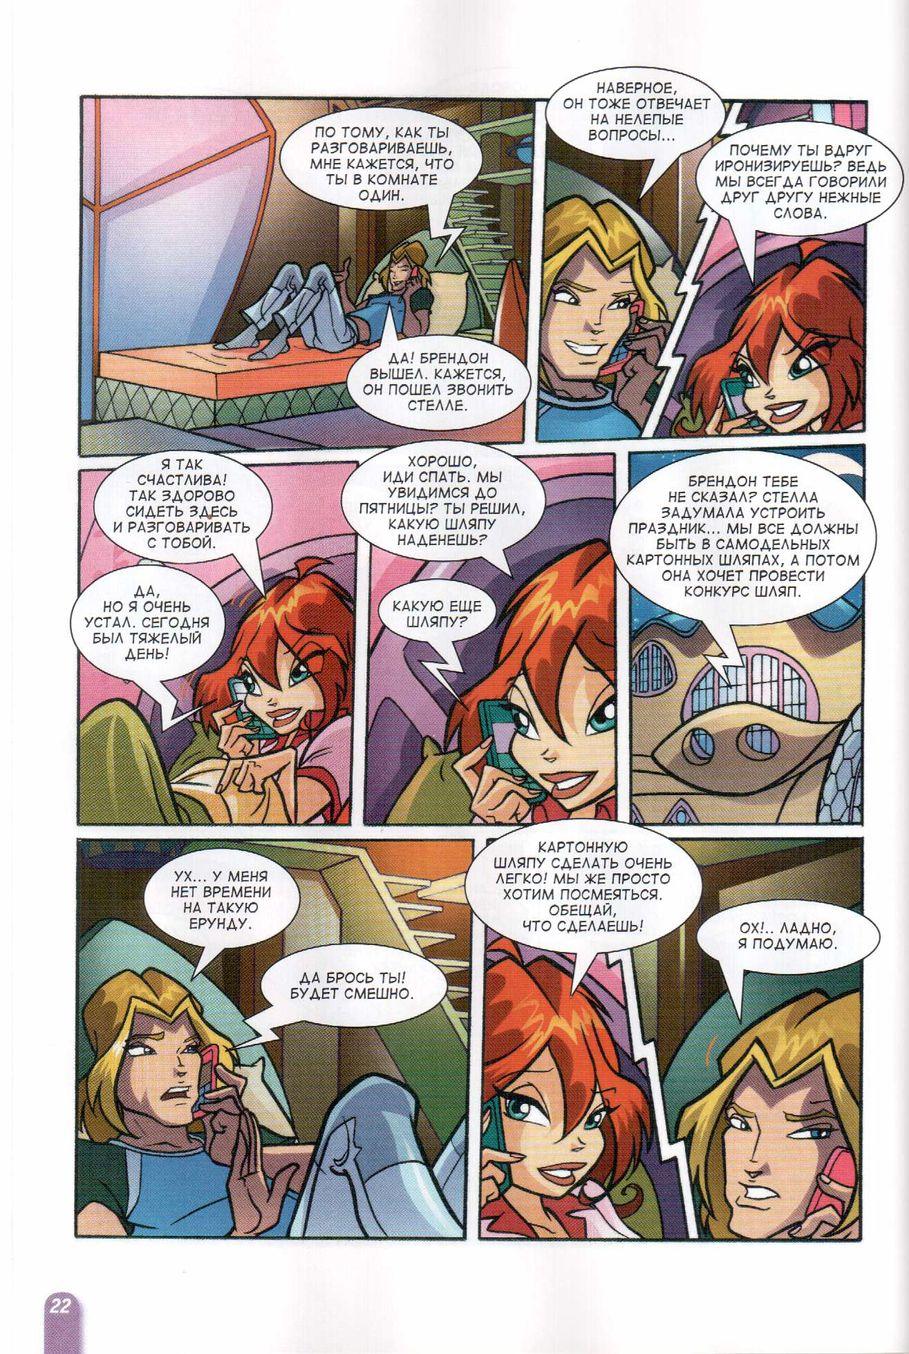 Комикс Винкс Winx - Любовь и ревность (Журнал Винкс №7 2011) - стр. 22